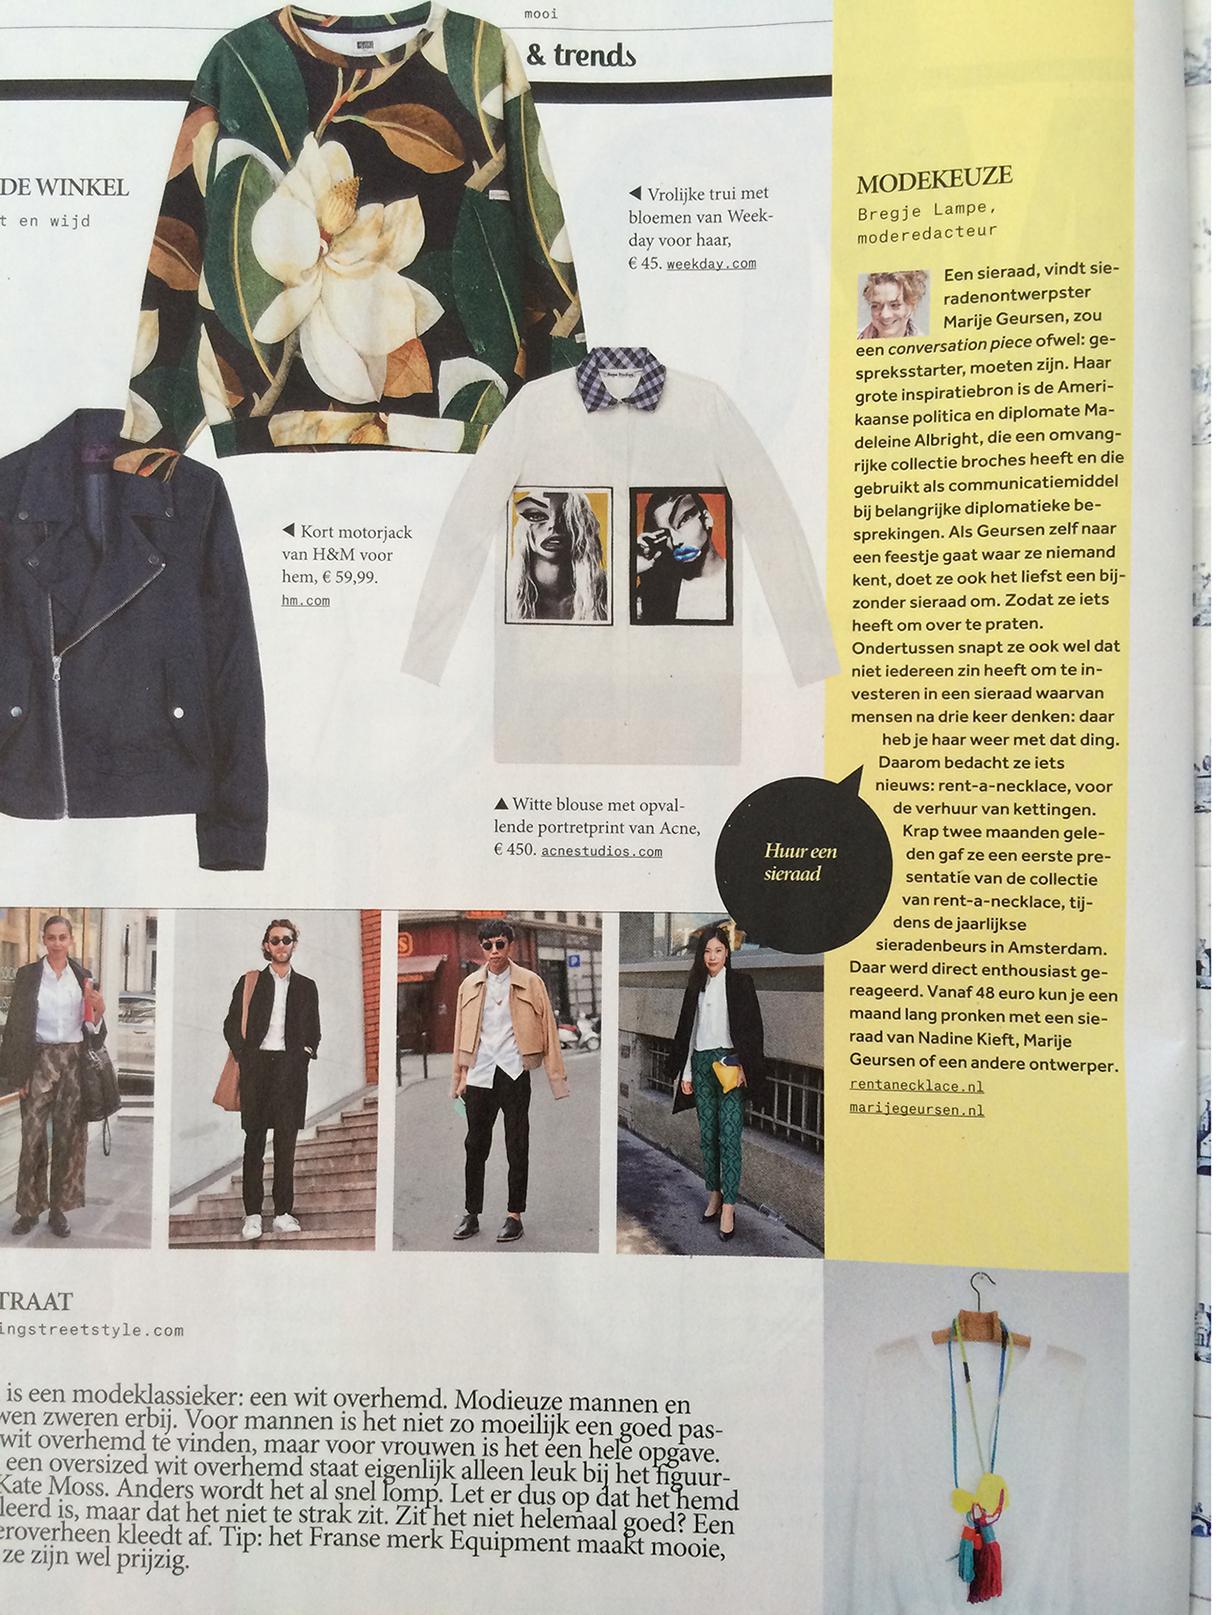 Publicatie VK Mag